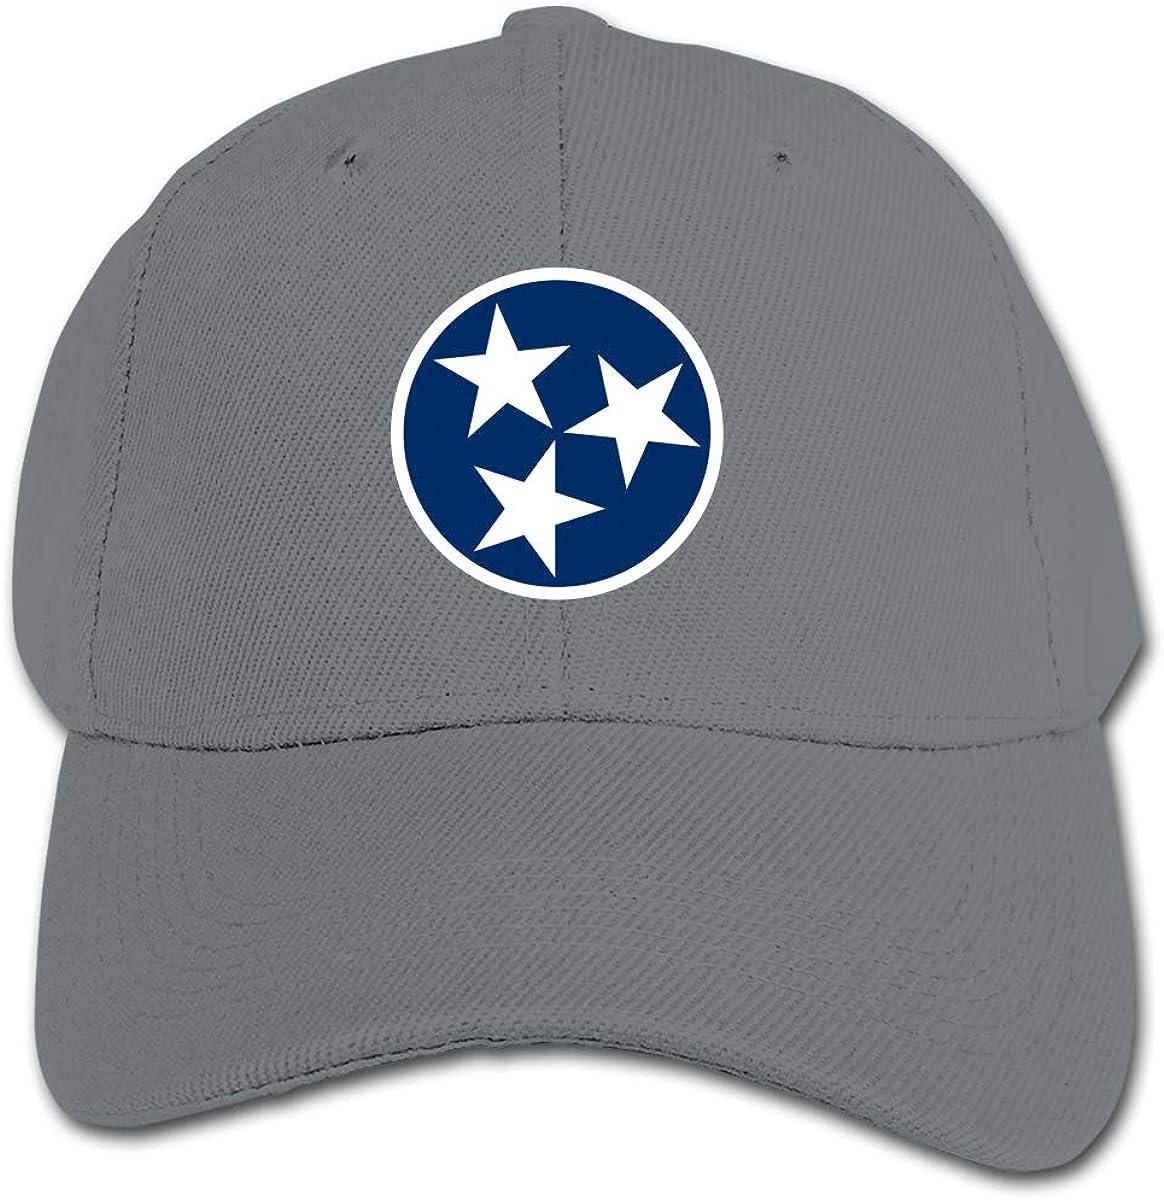 Tennessee State Flag Kids Baseball Cap Hat Unisex Toddler Sun Hat Adsjutable Trucker Hat